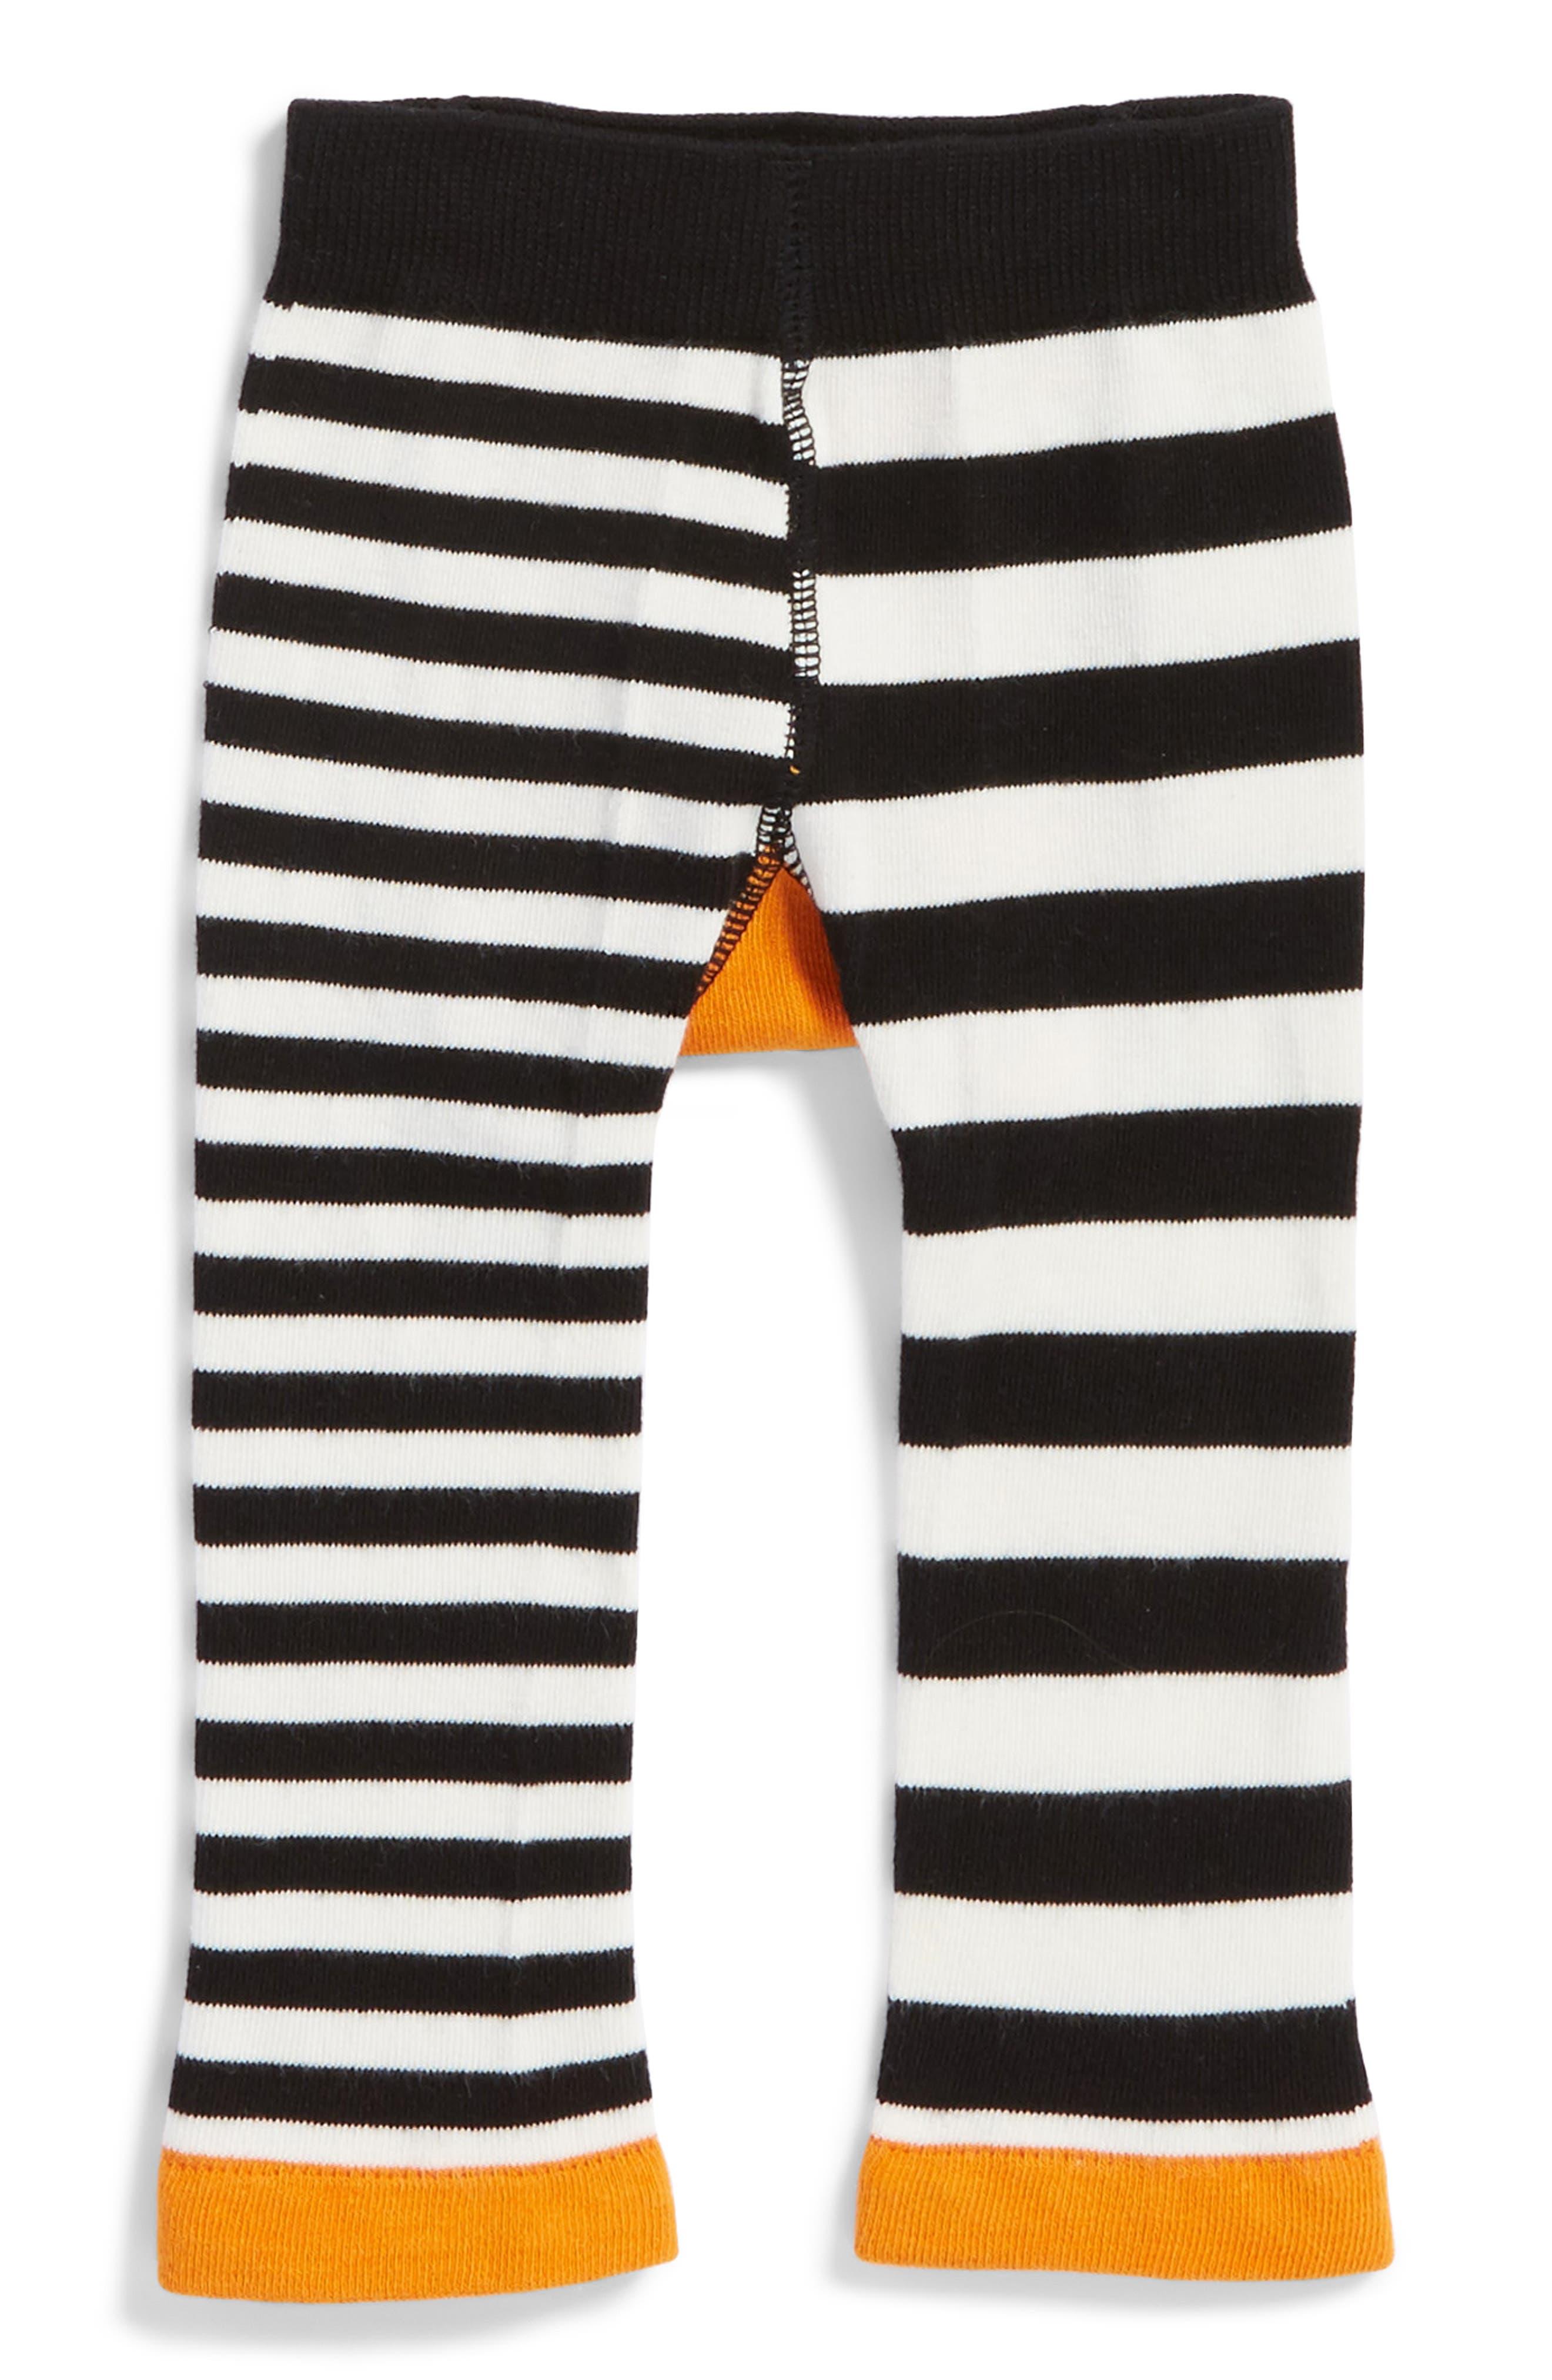 Fox Leggings,                             Alternate thumbnail 2, color,                             Orange/ Black/ Cream